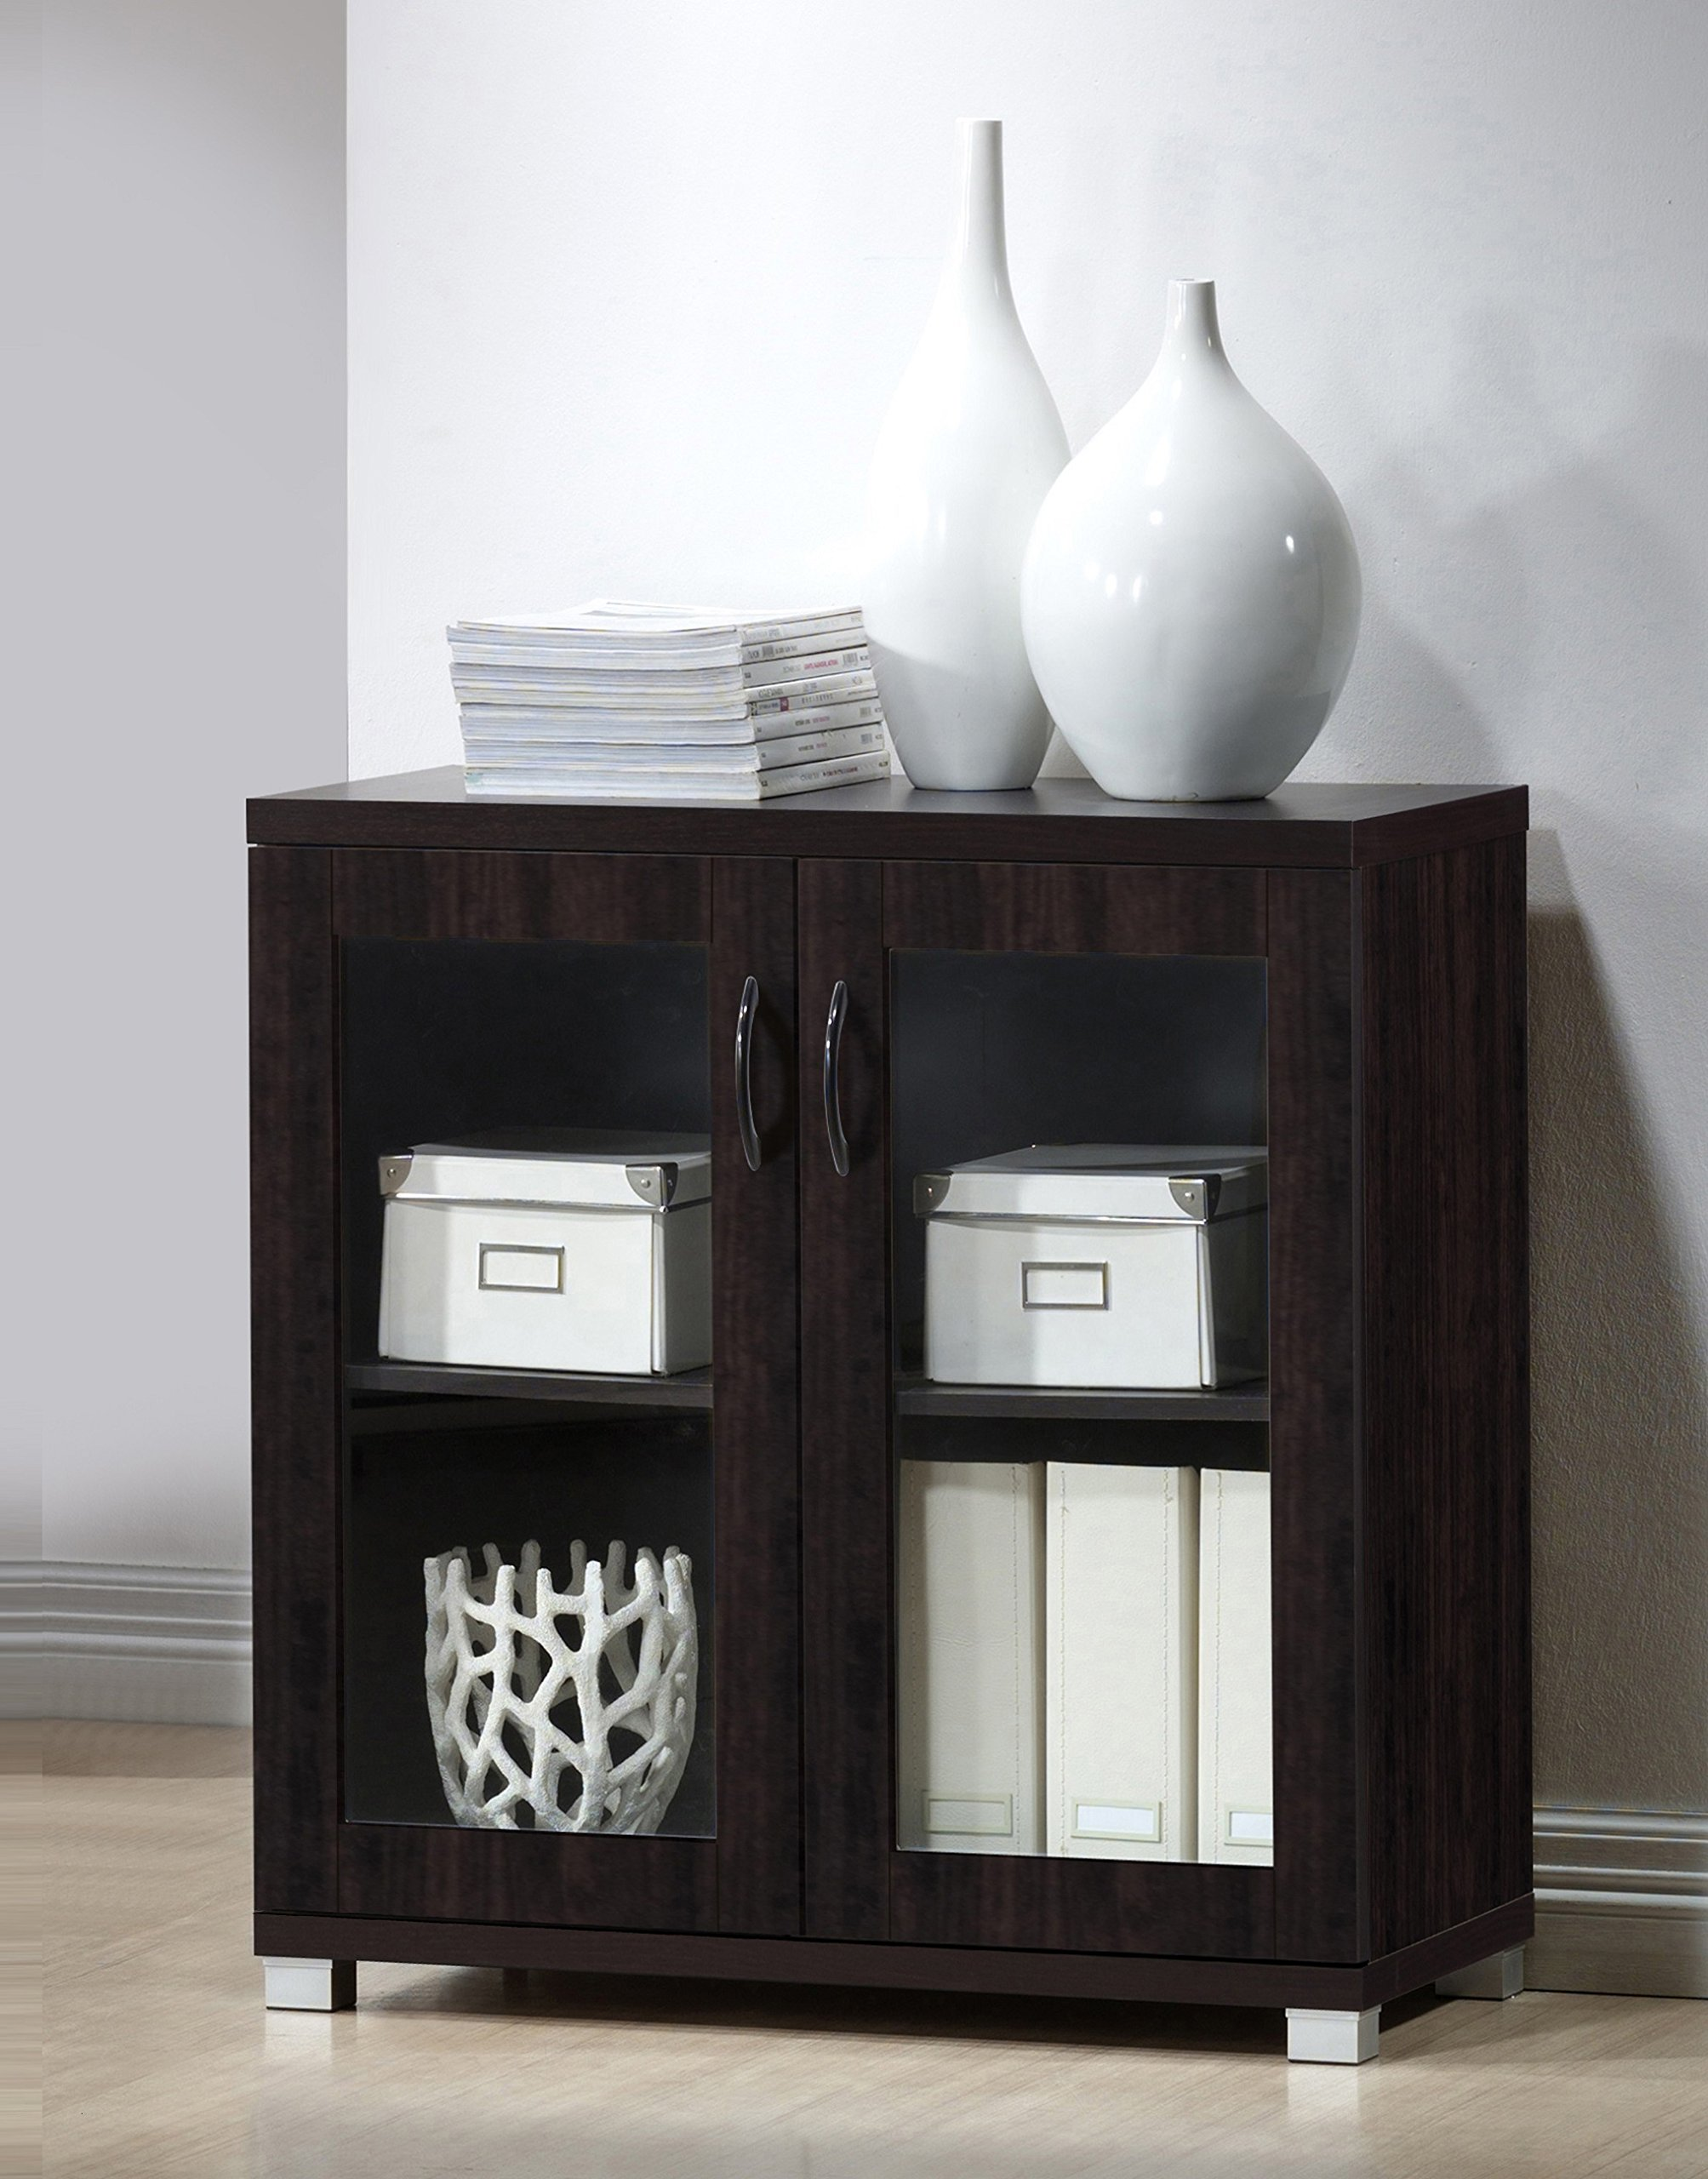 Baxton Studio Wholesale Interiors Zentra Sideboard Storage Cabinet with Glass Doors, Dark Brown by Baxton Studio